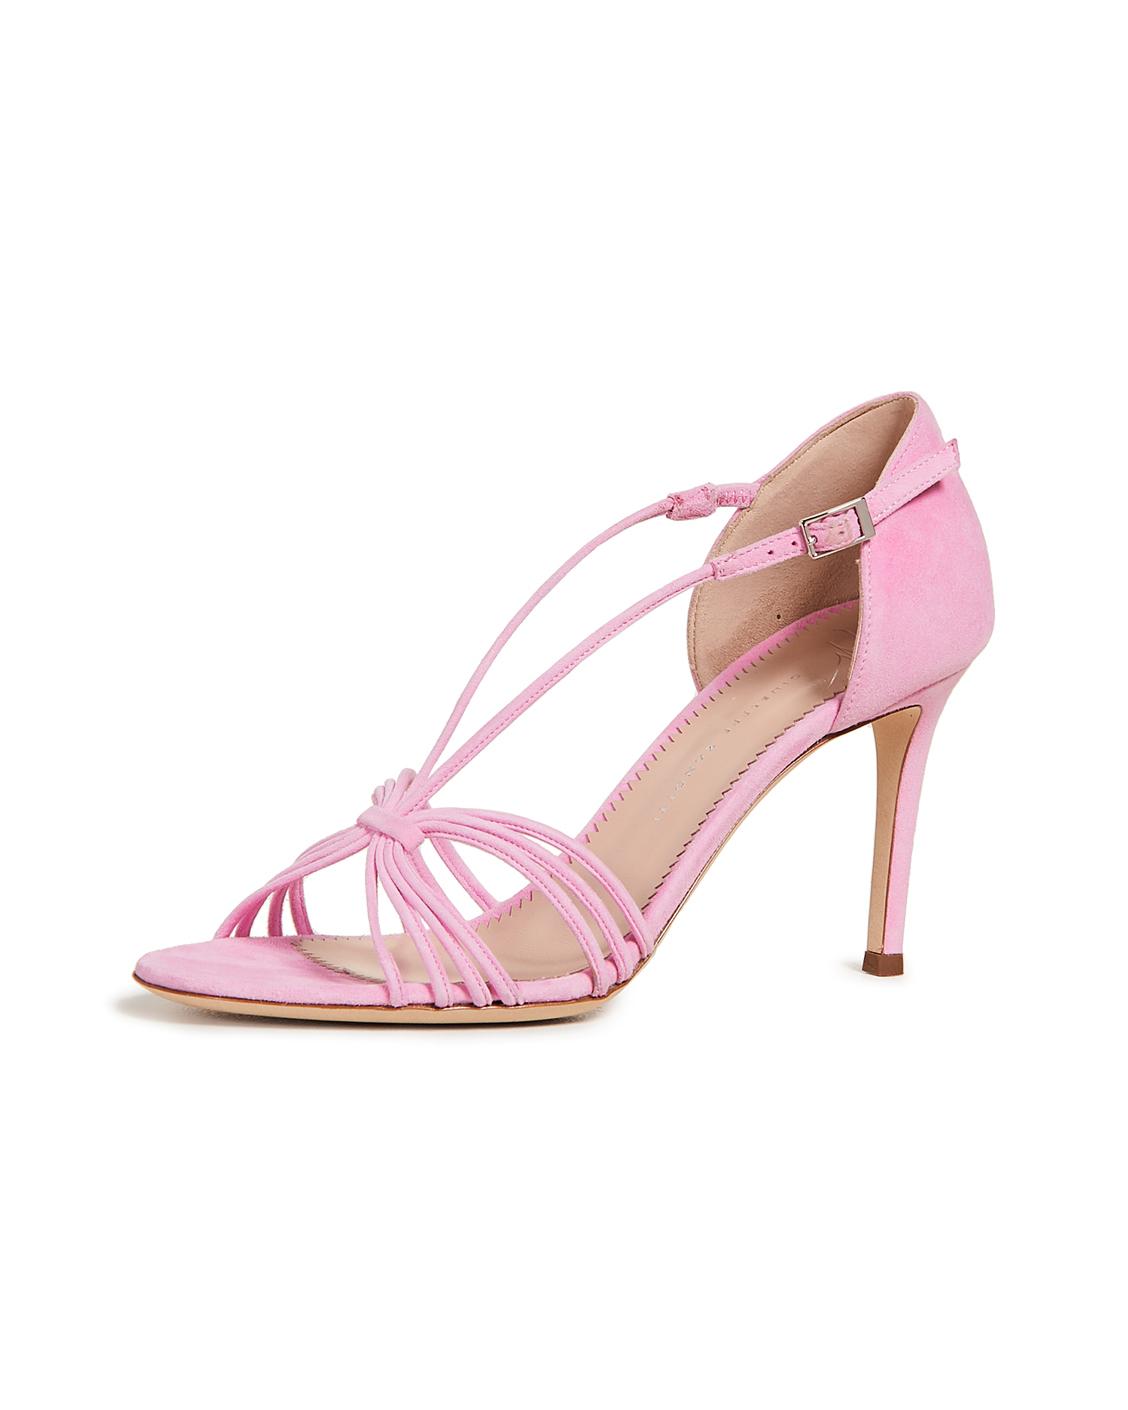 pink strappy high-heel sandals